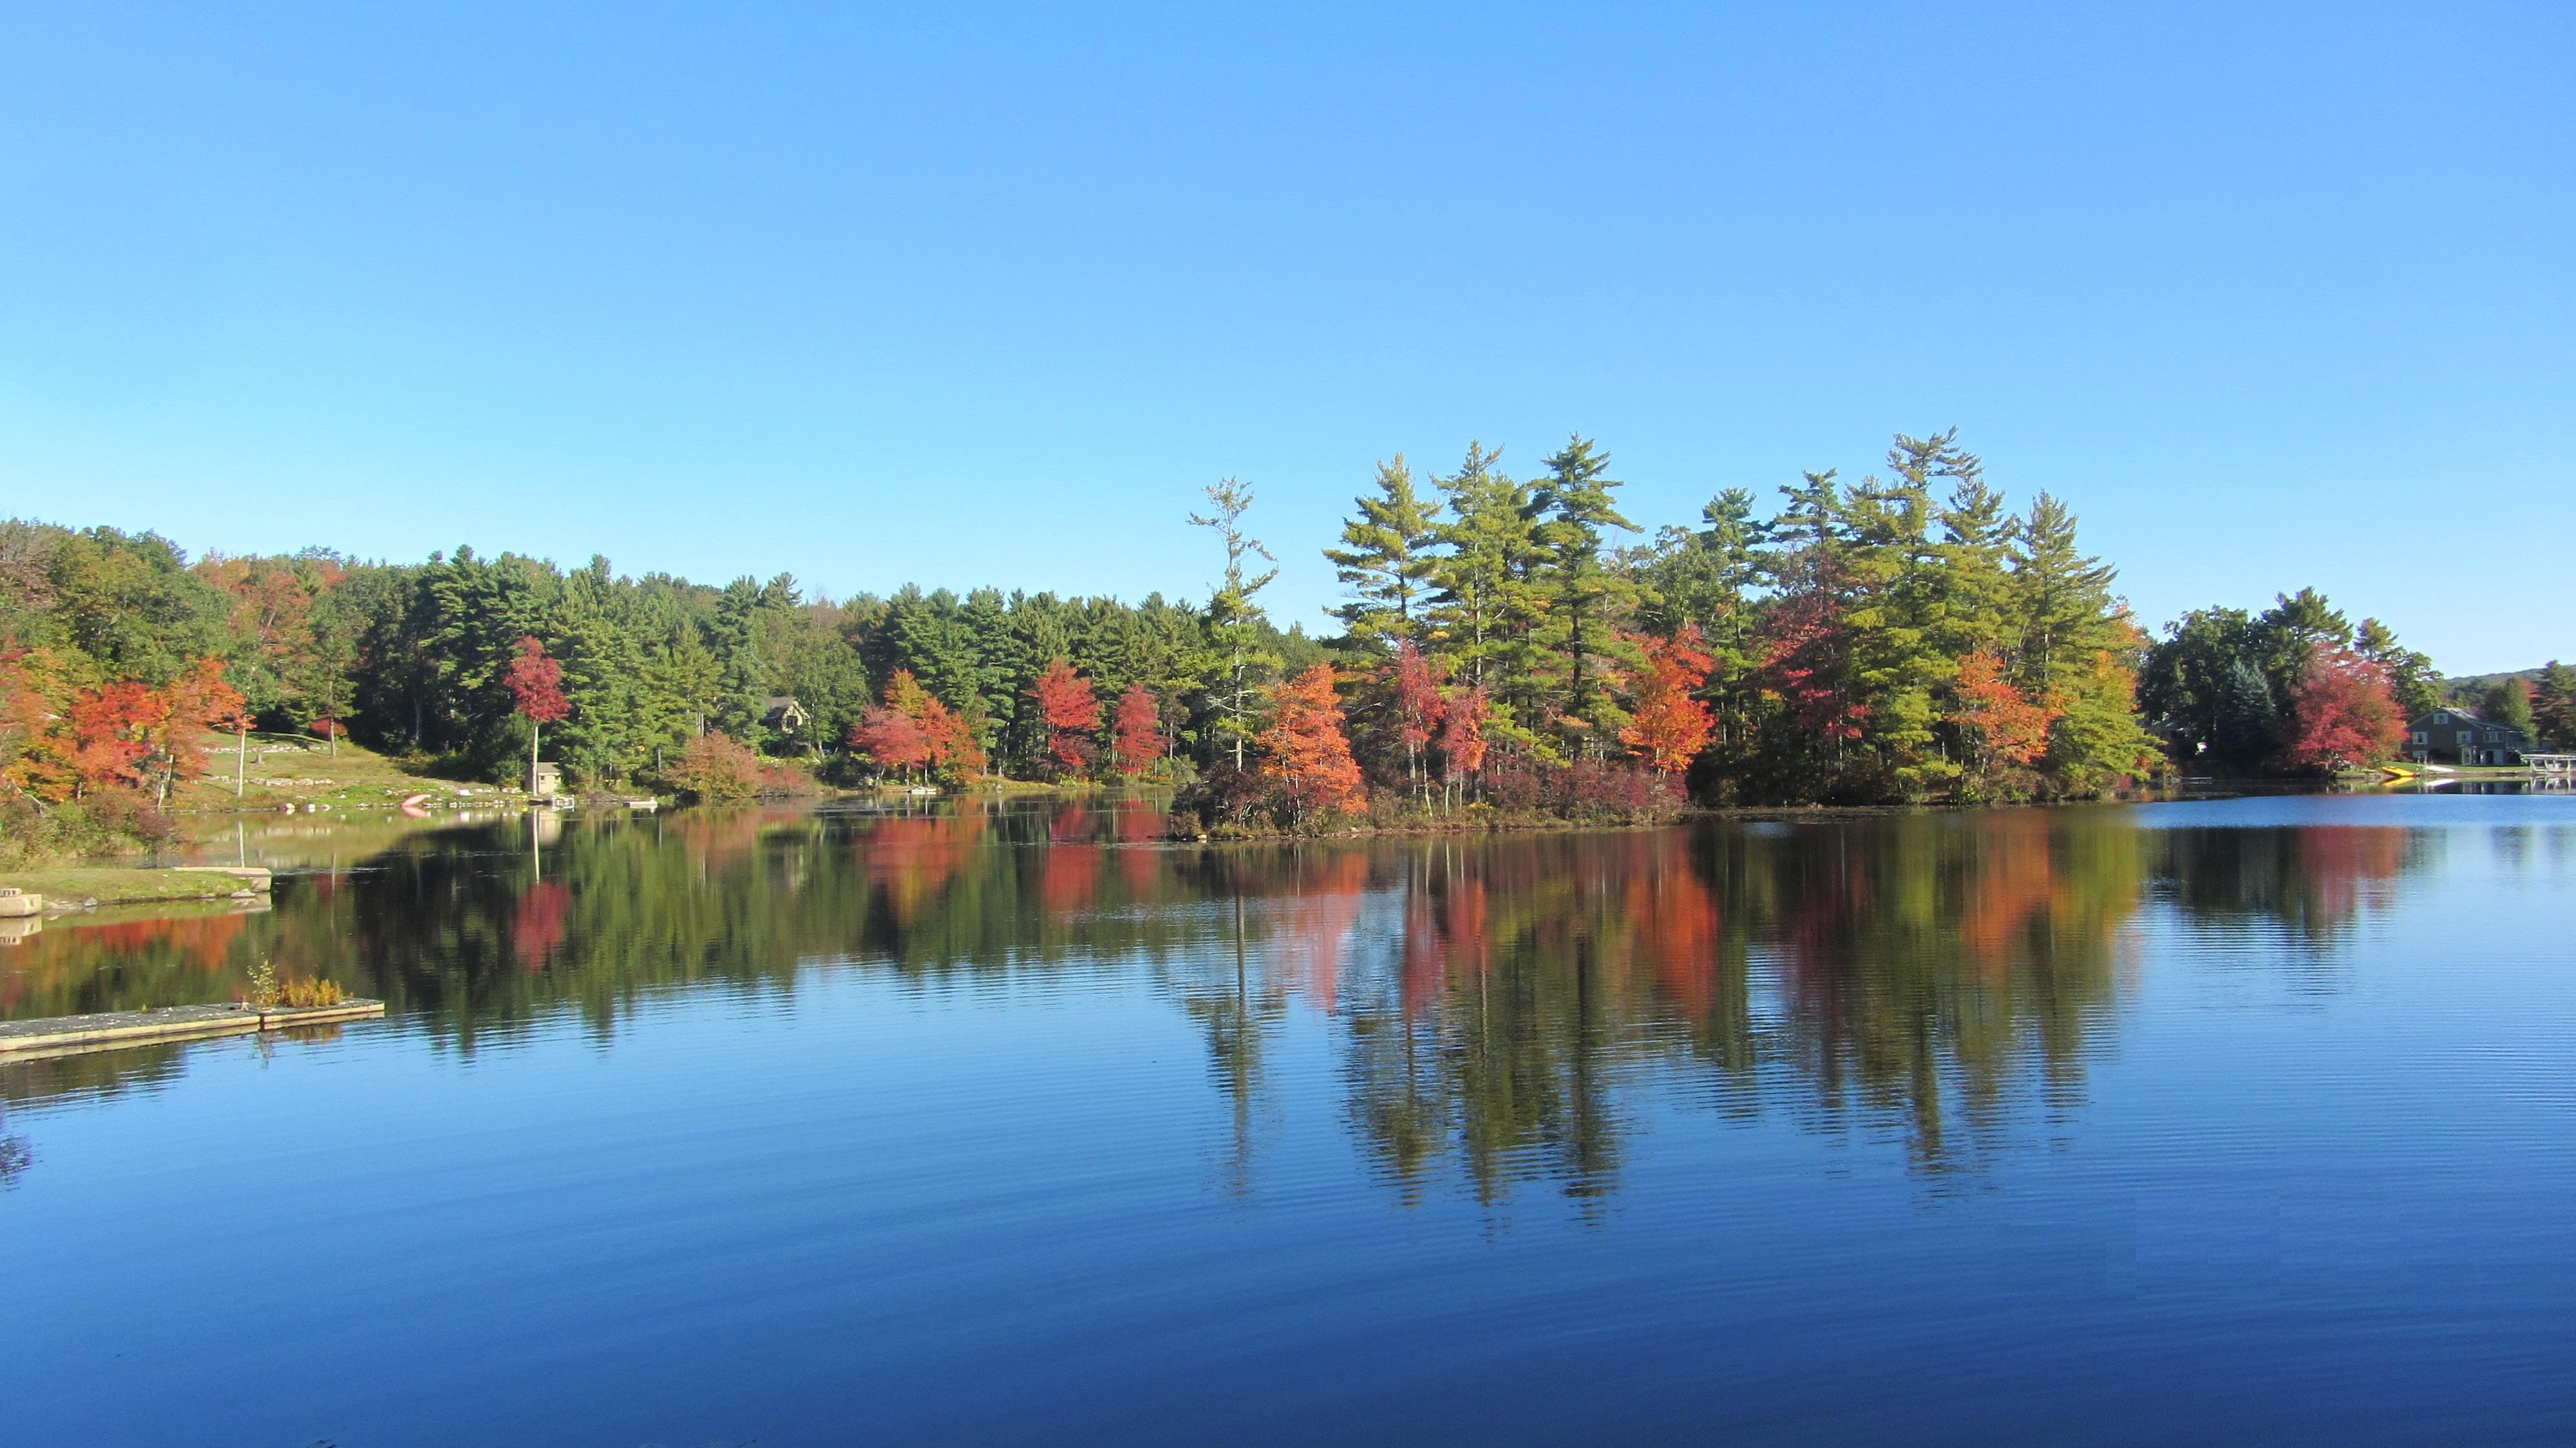 Thompson Pond